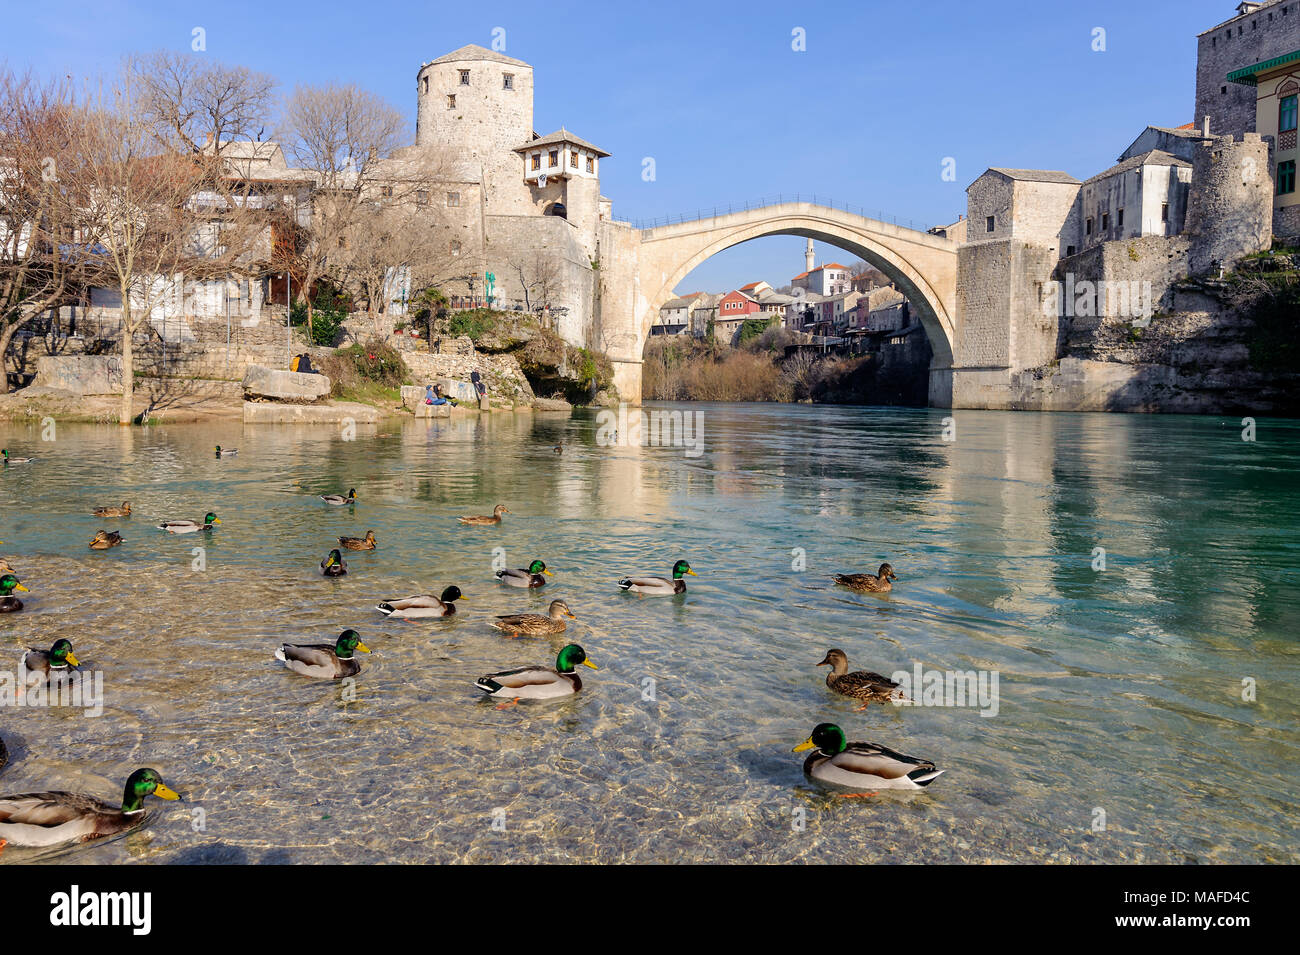 Stari Most (Old Bridge) panaroma landscape with wild ducks city of Mostar in Bosnia - Stock Image